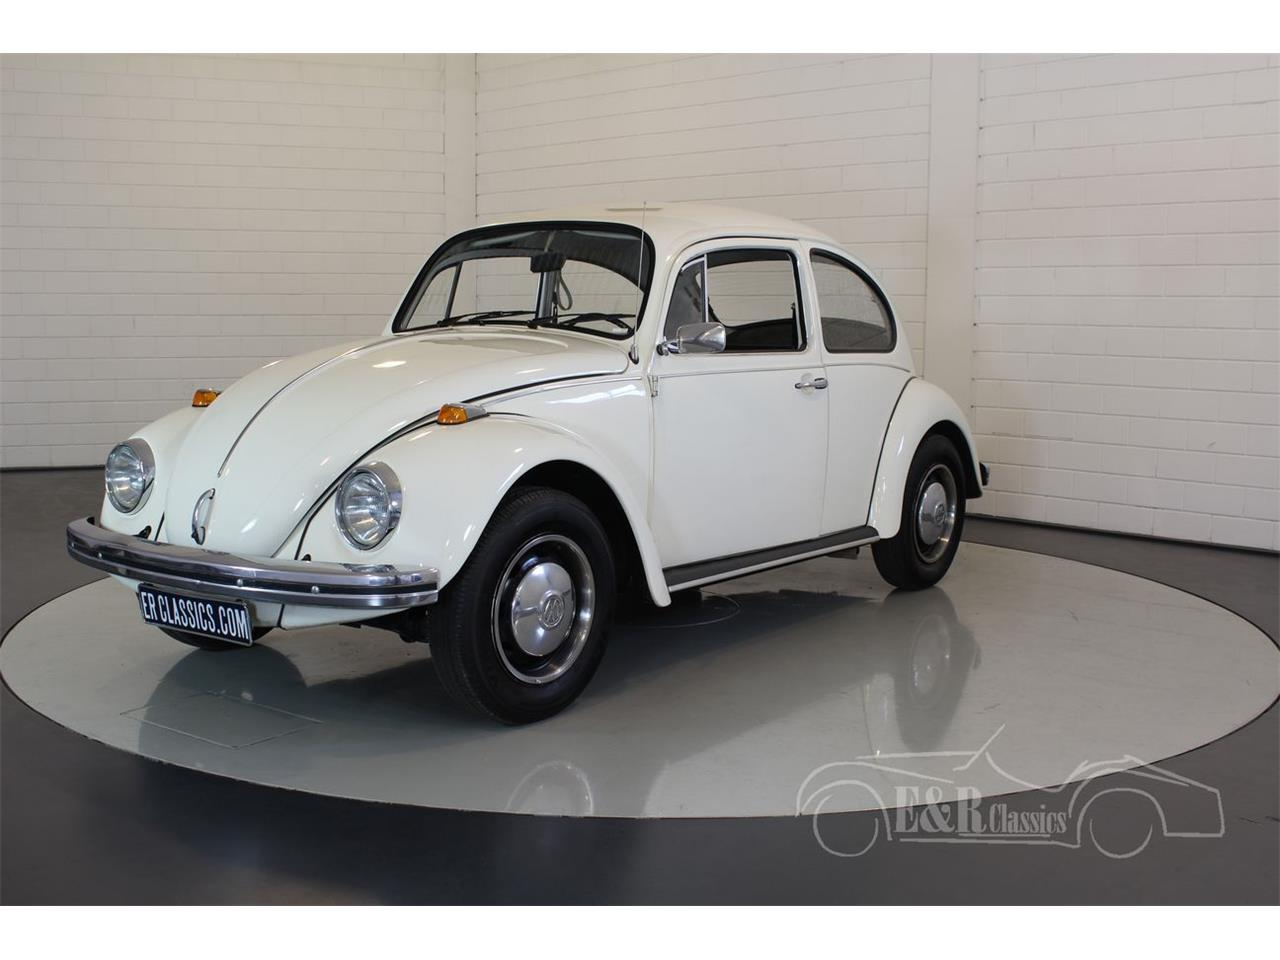 Large Picture of '73 Volkswagen Beetle - $13,500.00 - QJ2U